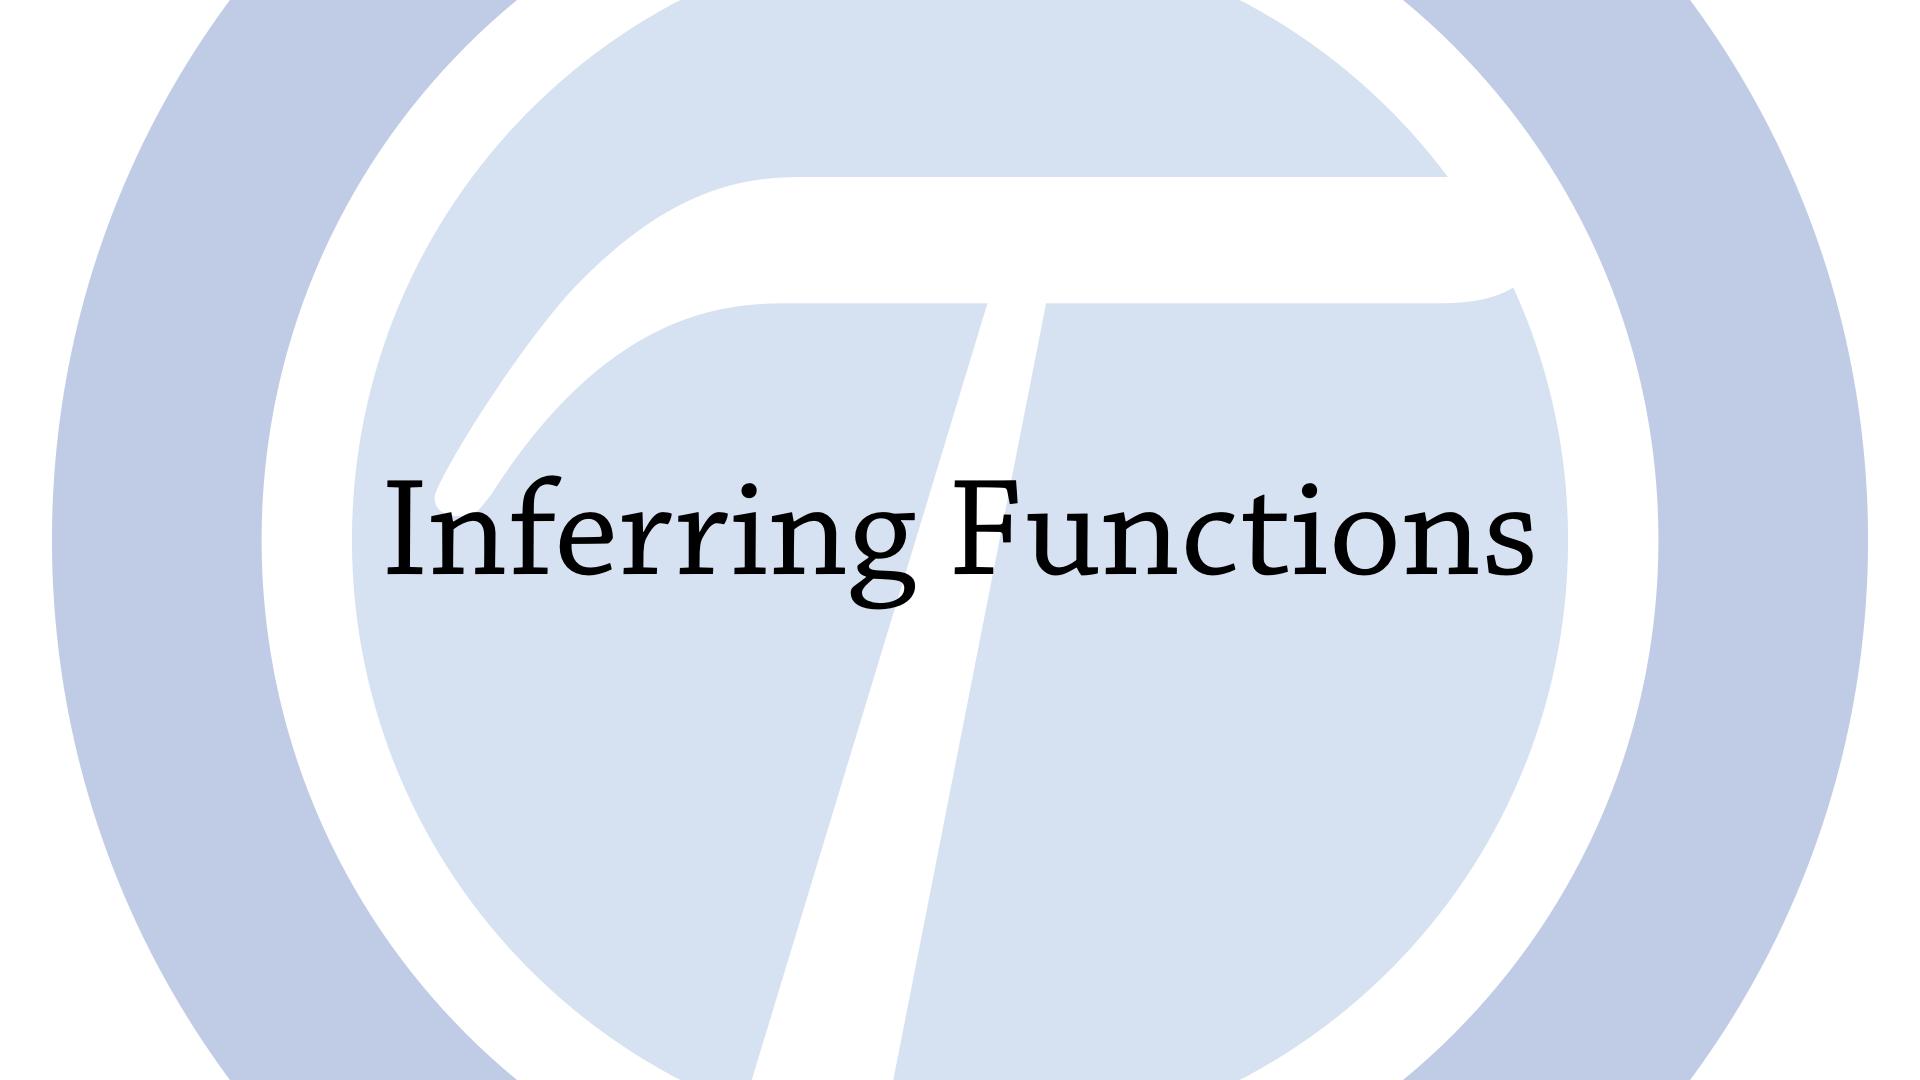 Inferring Functions